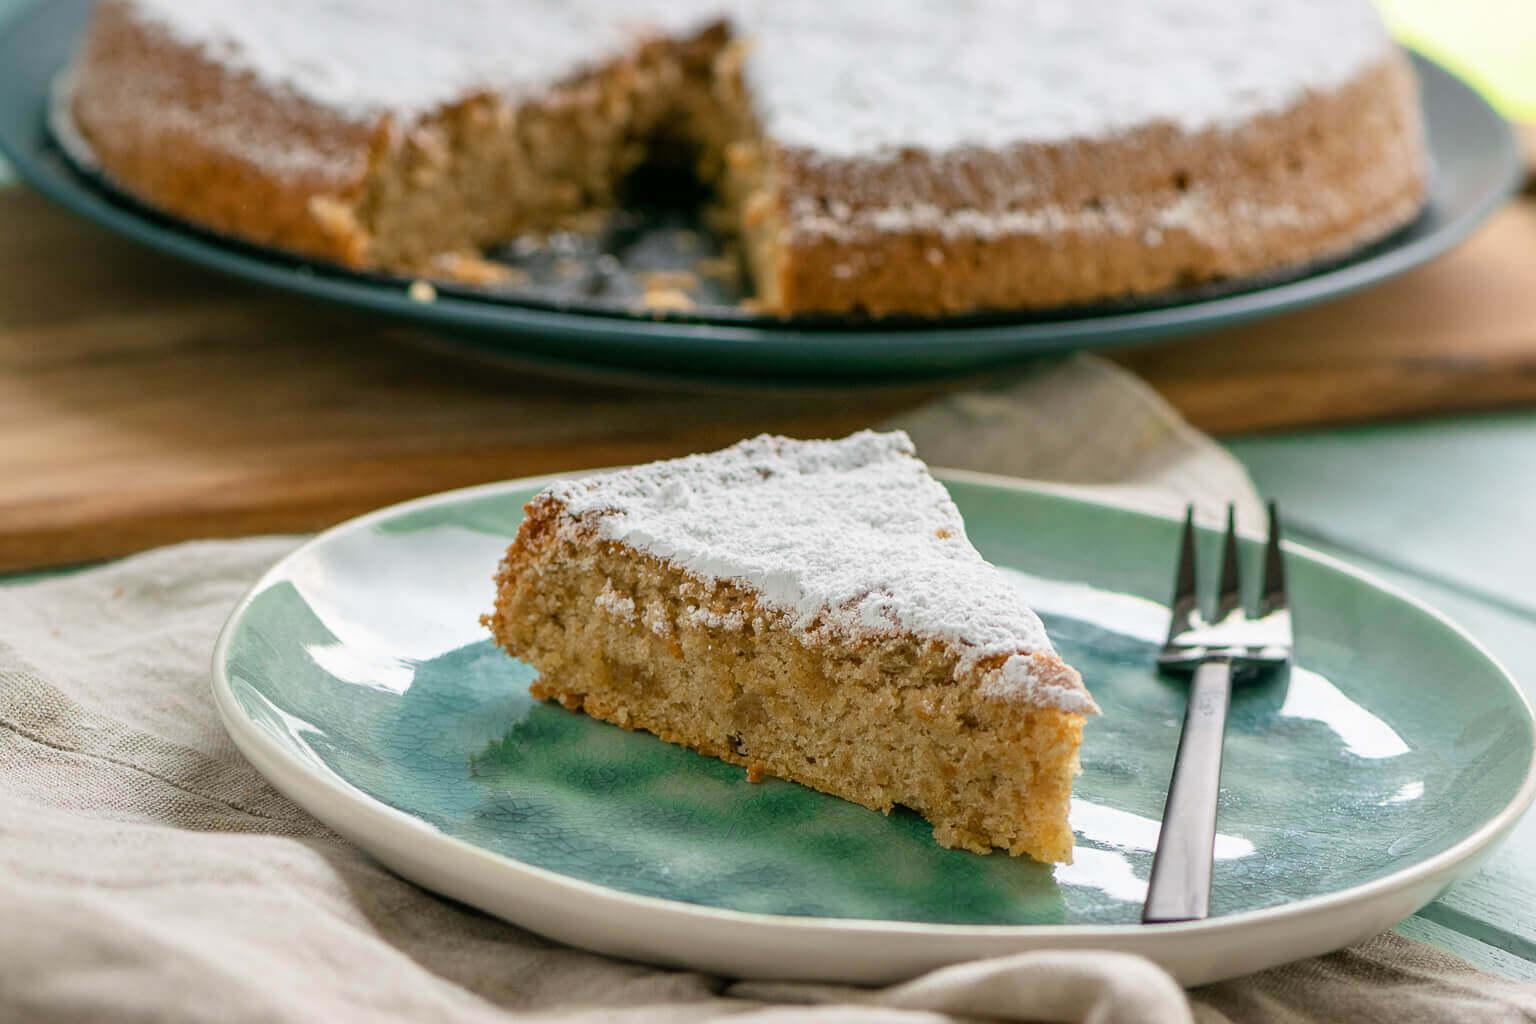 Mega lecker & saftig – Mallorquinischer Mandelkuchen